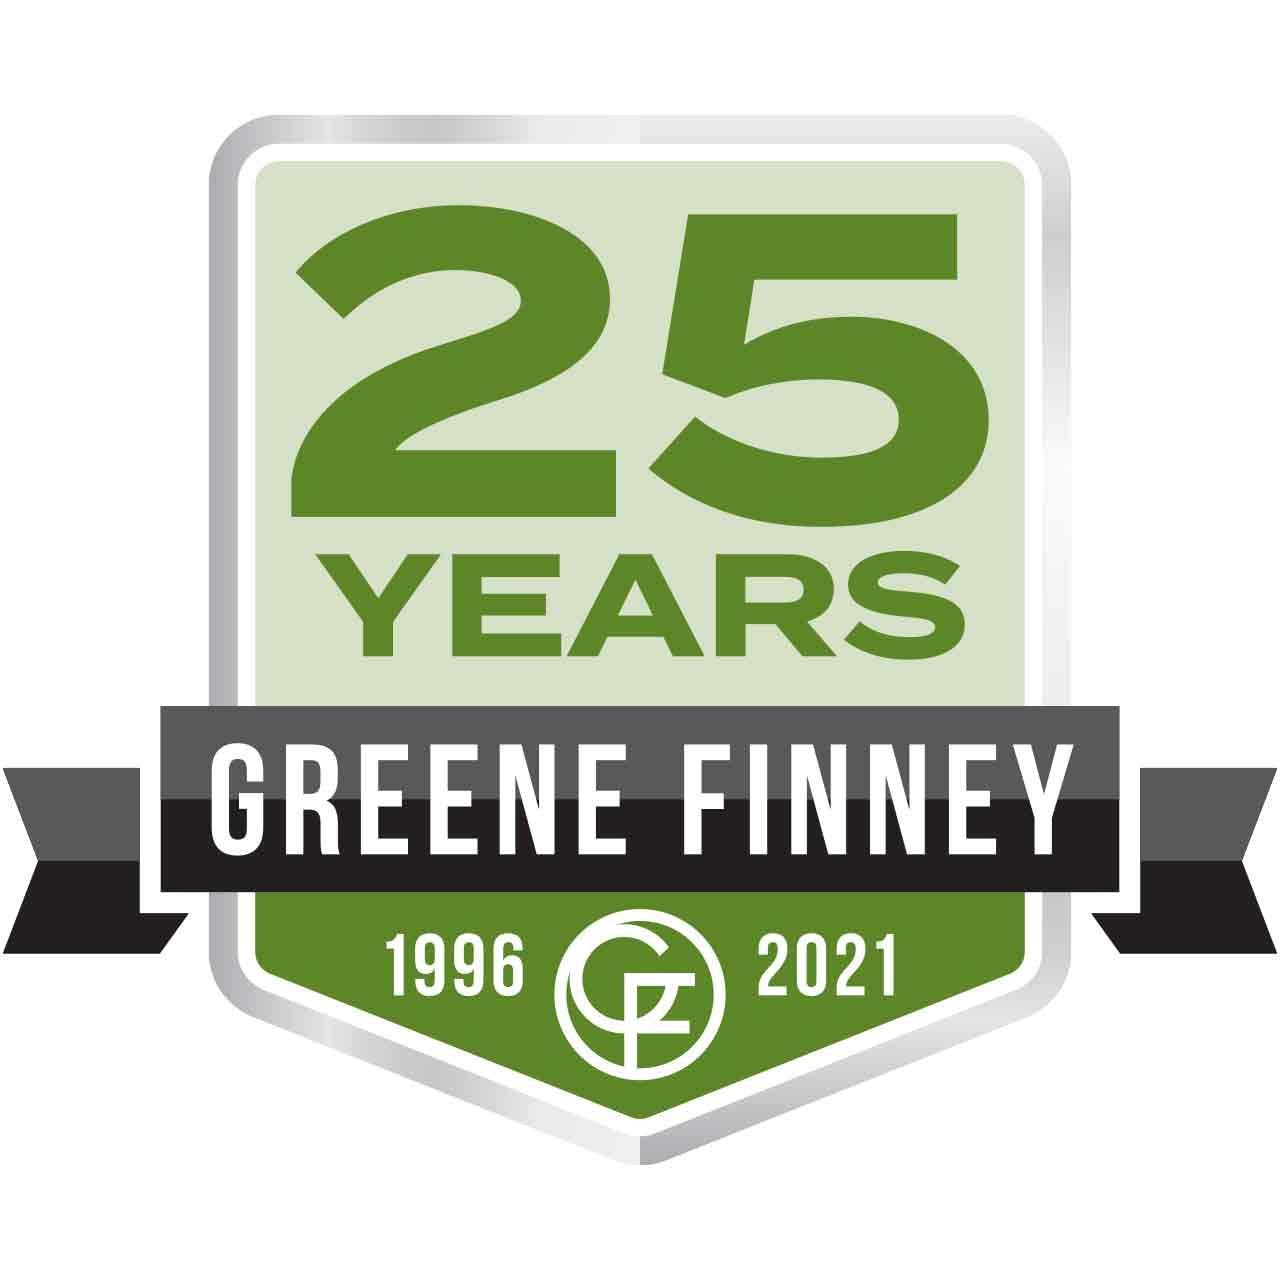 Greene Finney 25 year